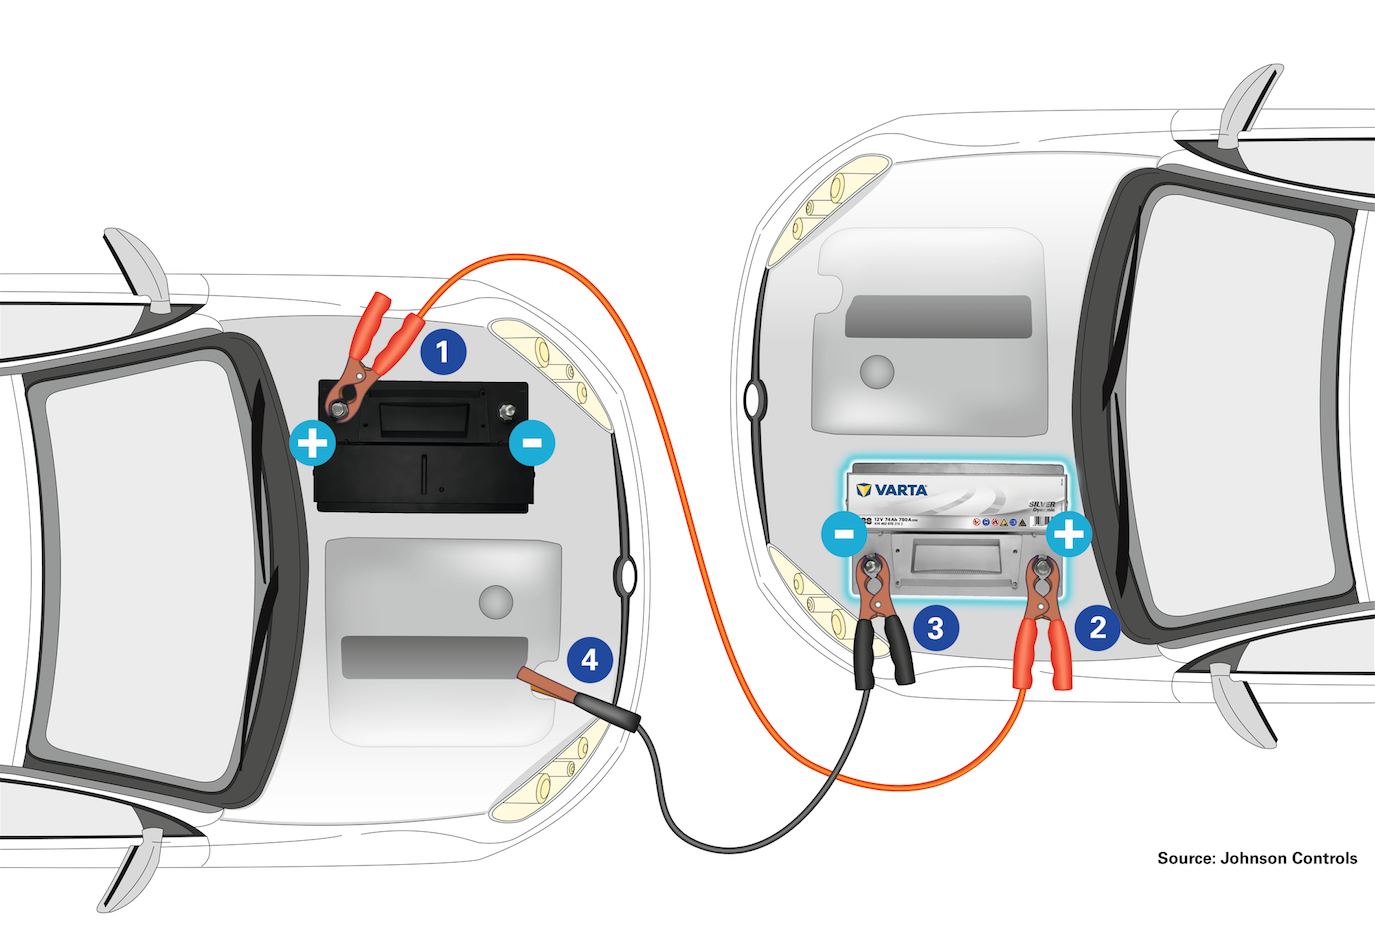 3 batterie tipps f r das auto im winter mein autolexikon. Black Bedroom Furniture Sets. Home Design Ideas